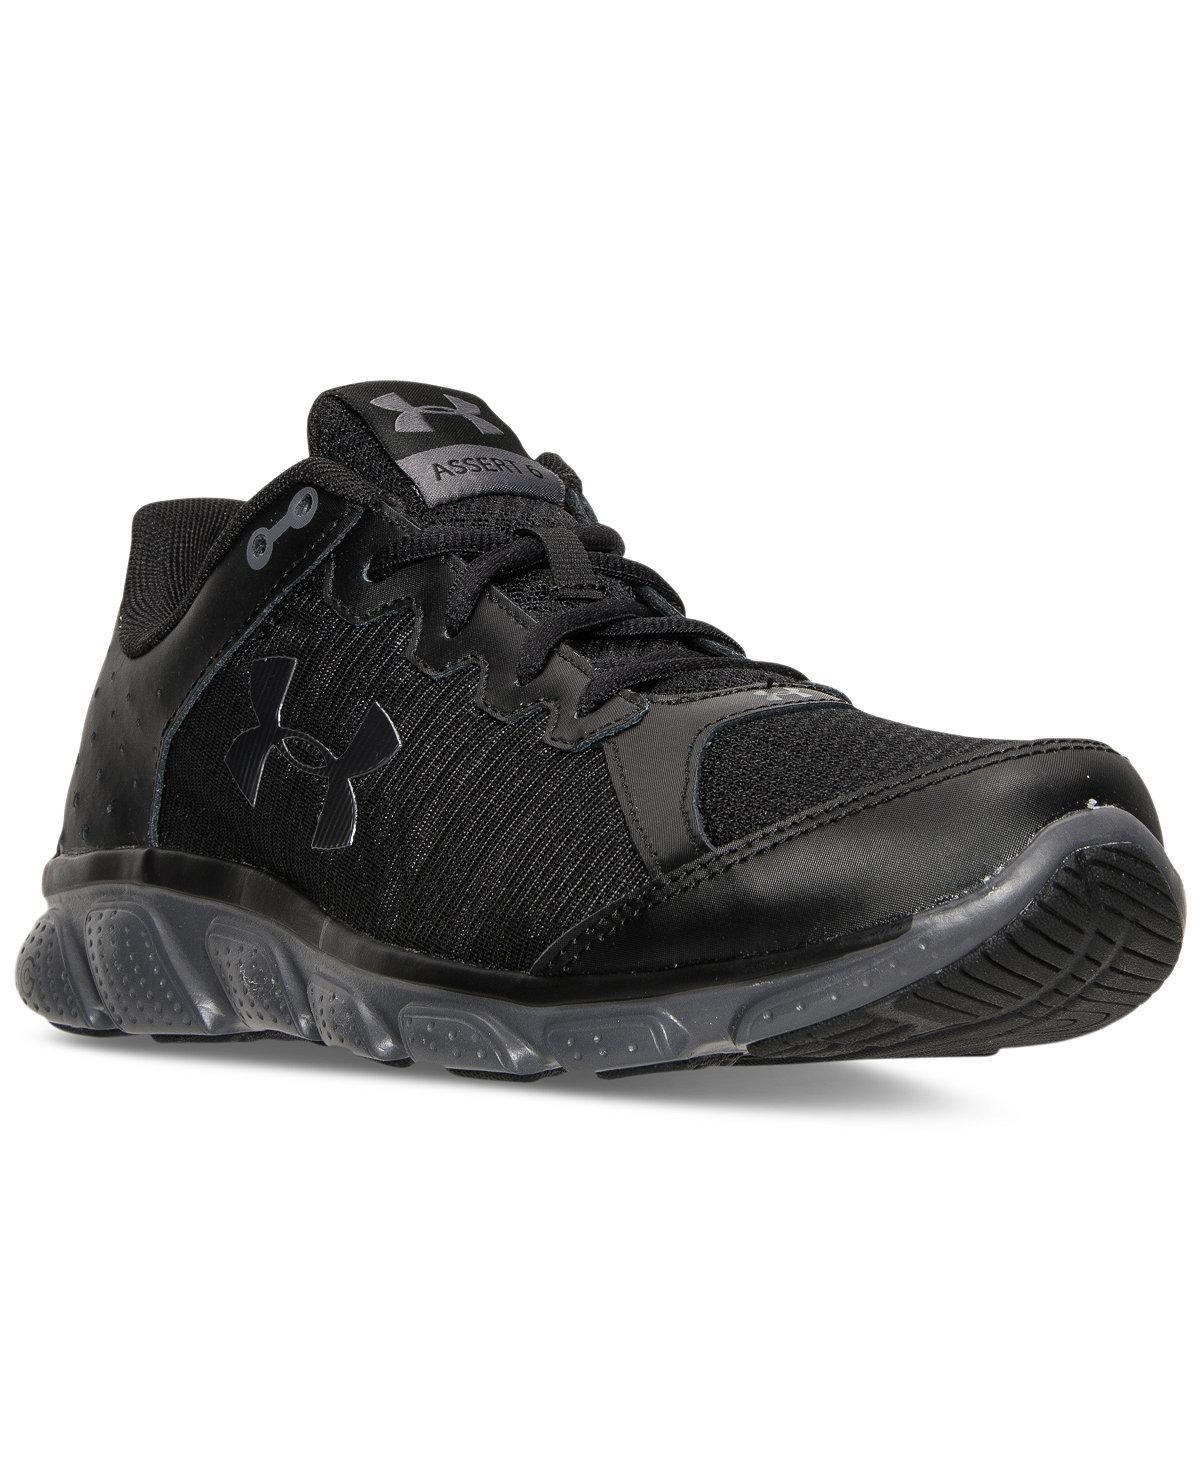 Men's Micro G Assert 6 Running Sneakers Under Armour, solid black, Macys $39.98 w/free in store pickup